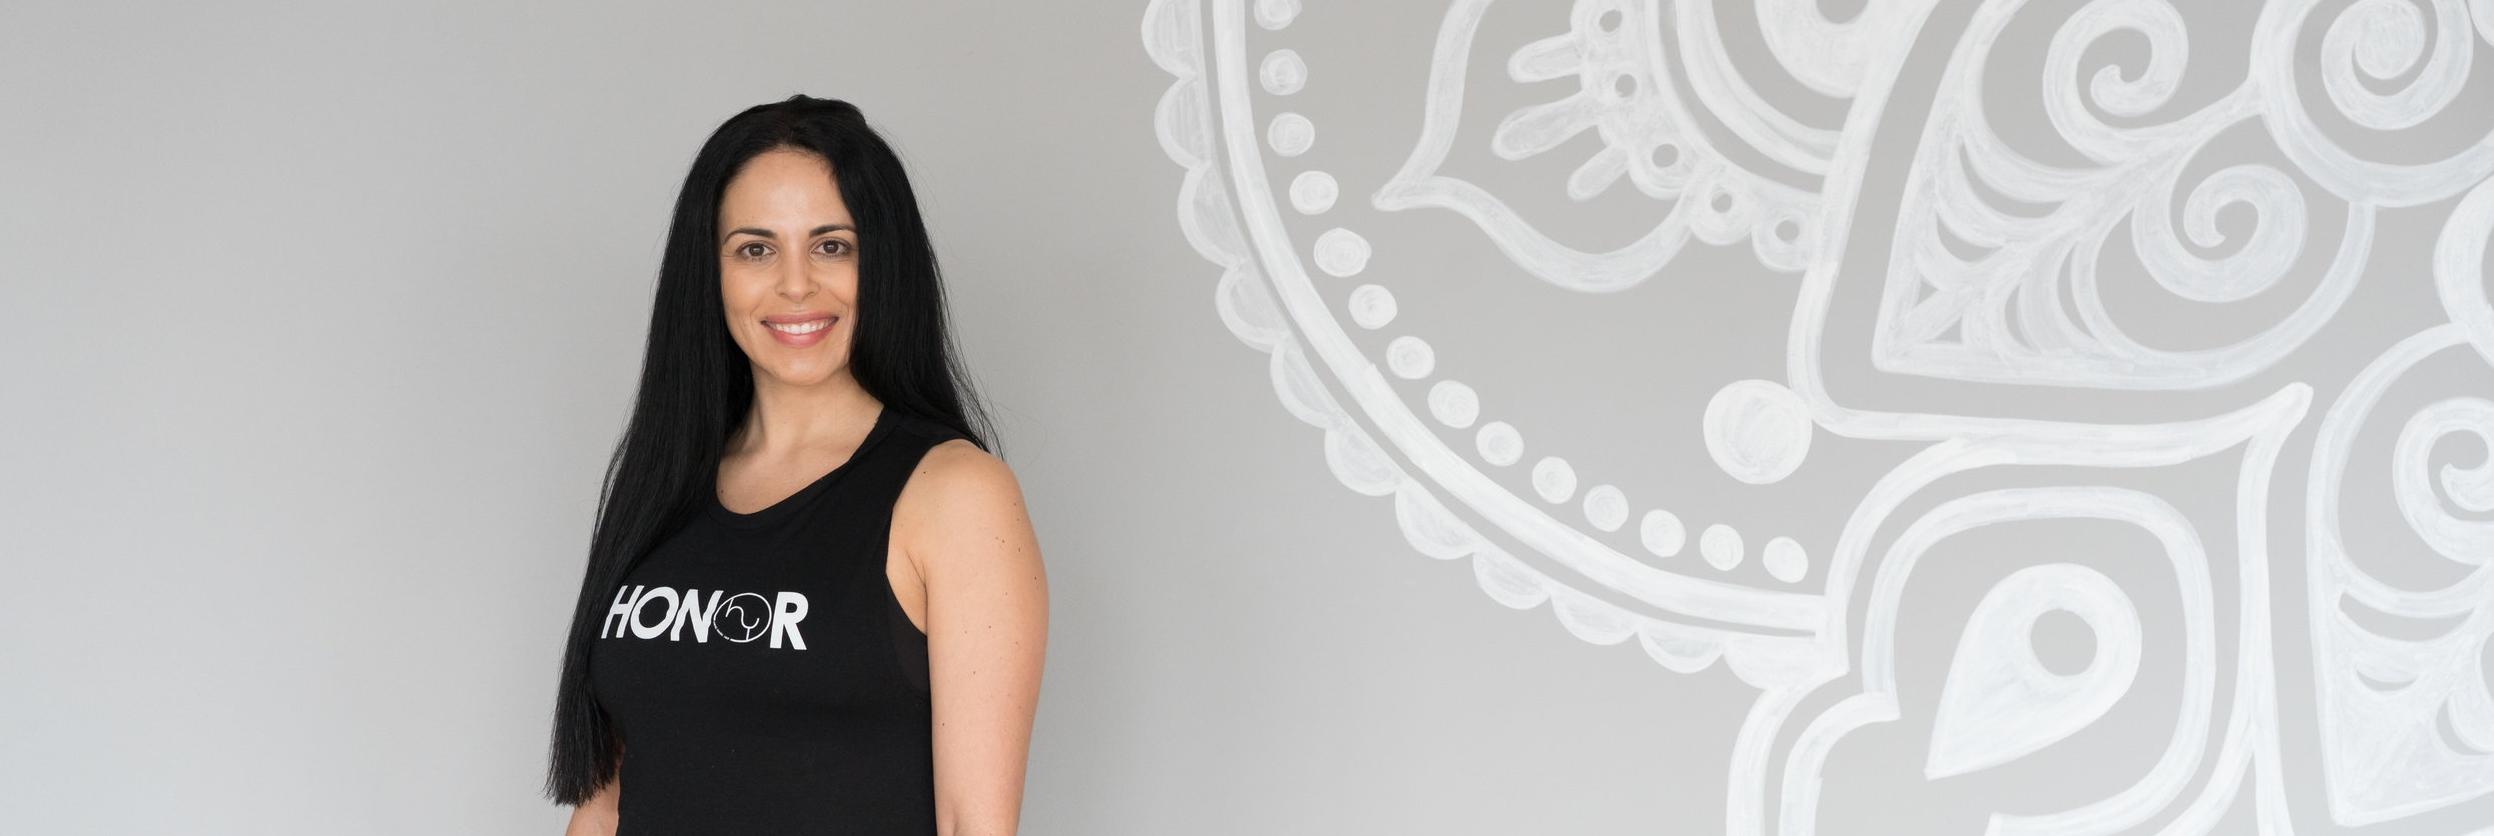 Maria Parella Turco, CEO and Founder of Honor Yoga